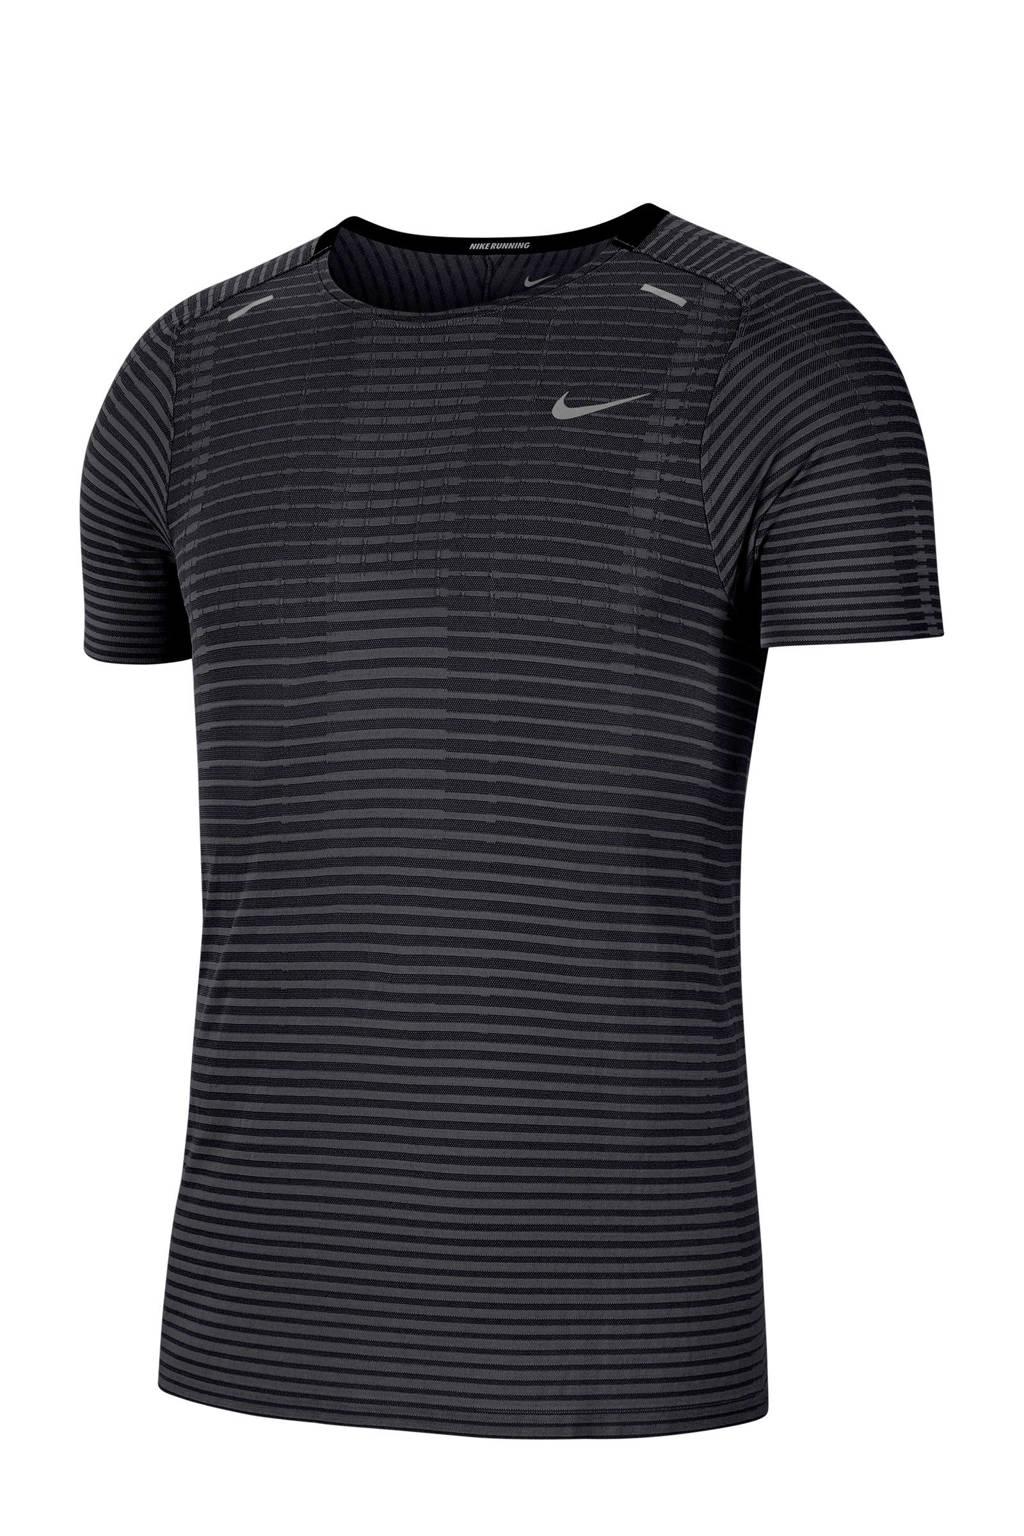 Nike   TechKnit hardloopshirt antraciet, Antraciet